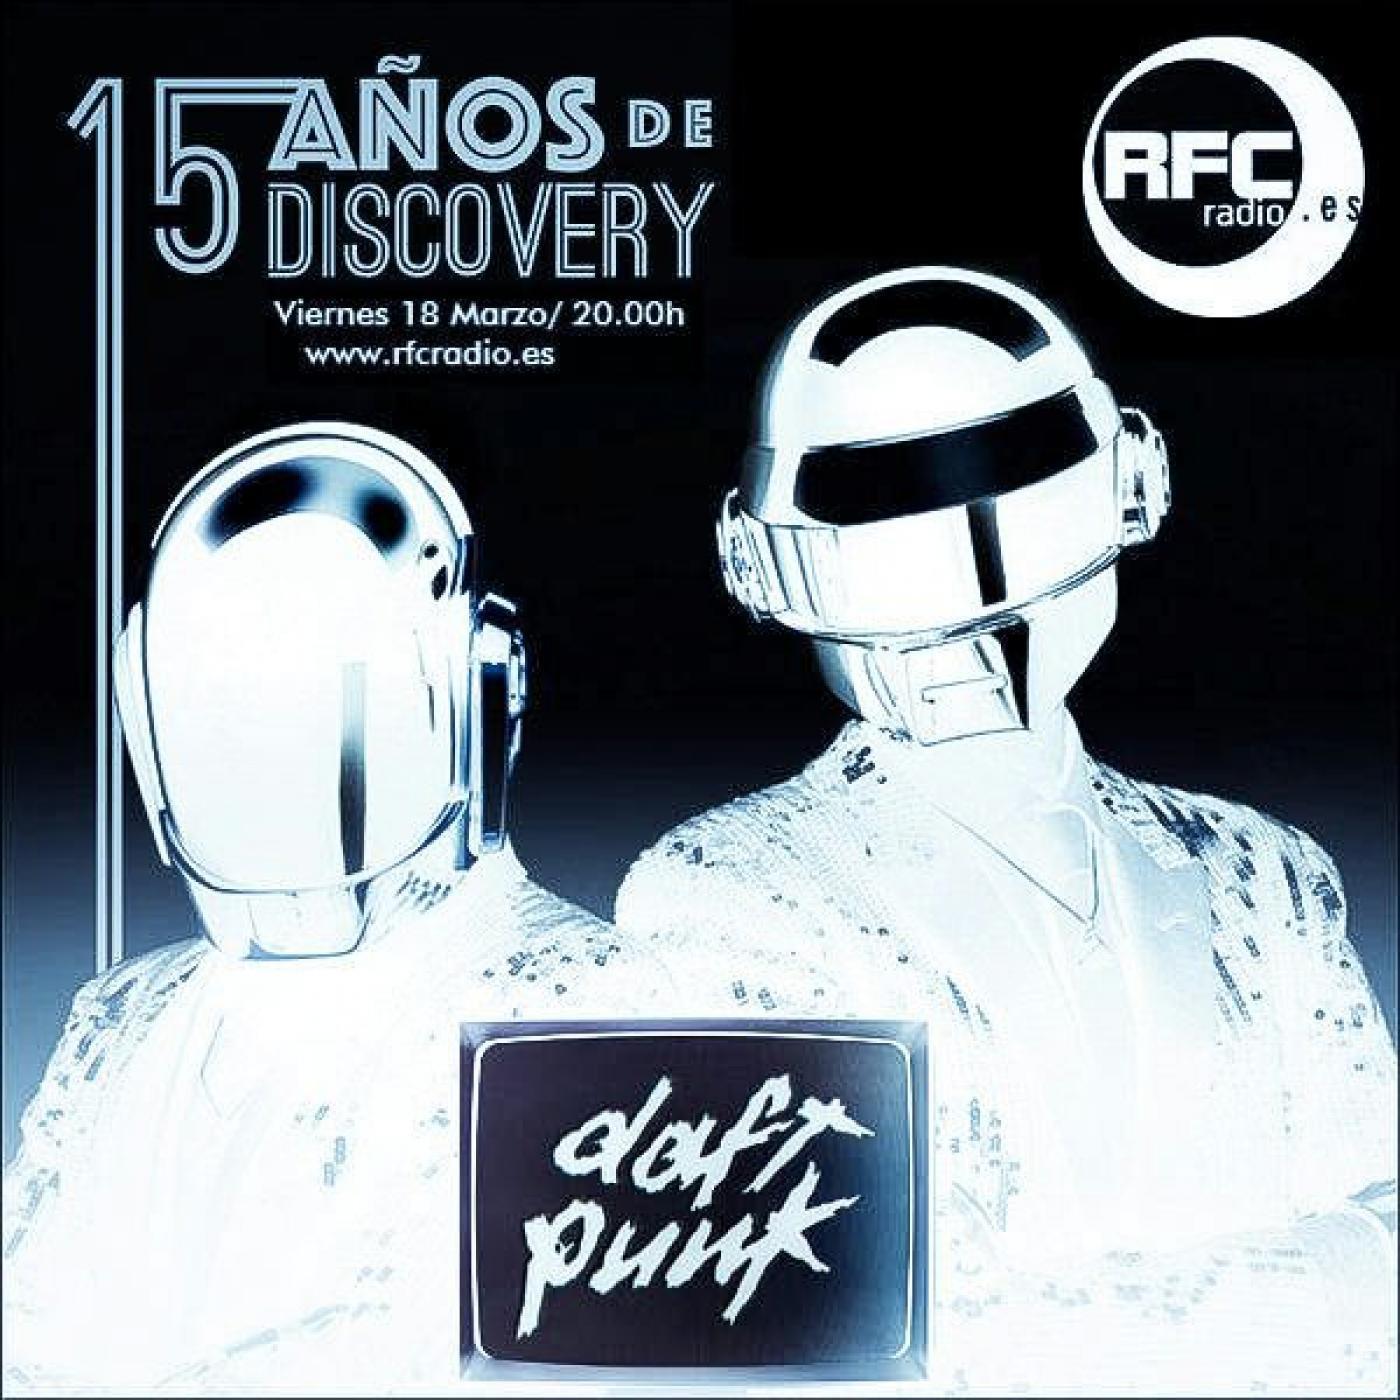 Especial Daft Punk - 15 aniversario de Discovery